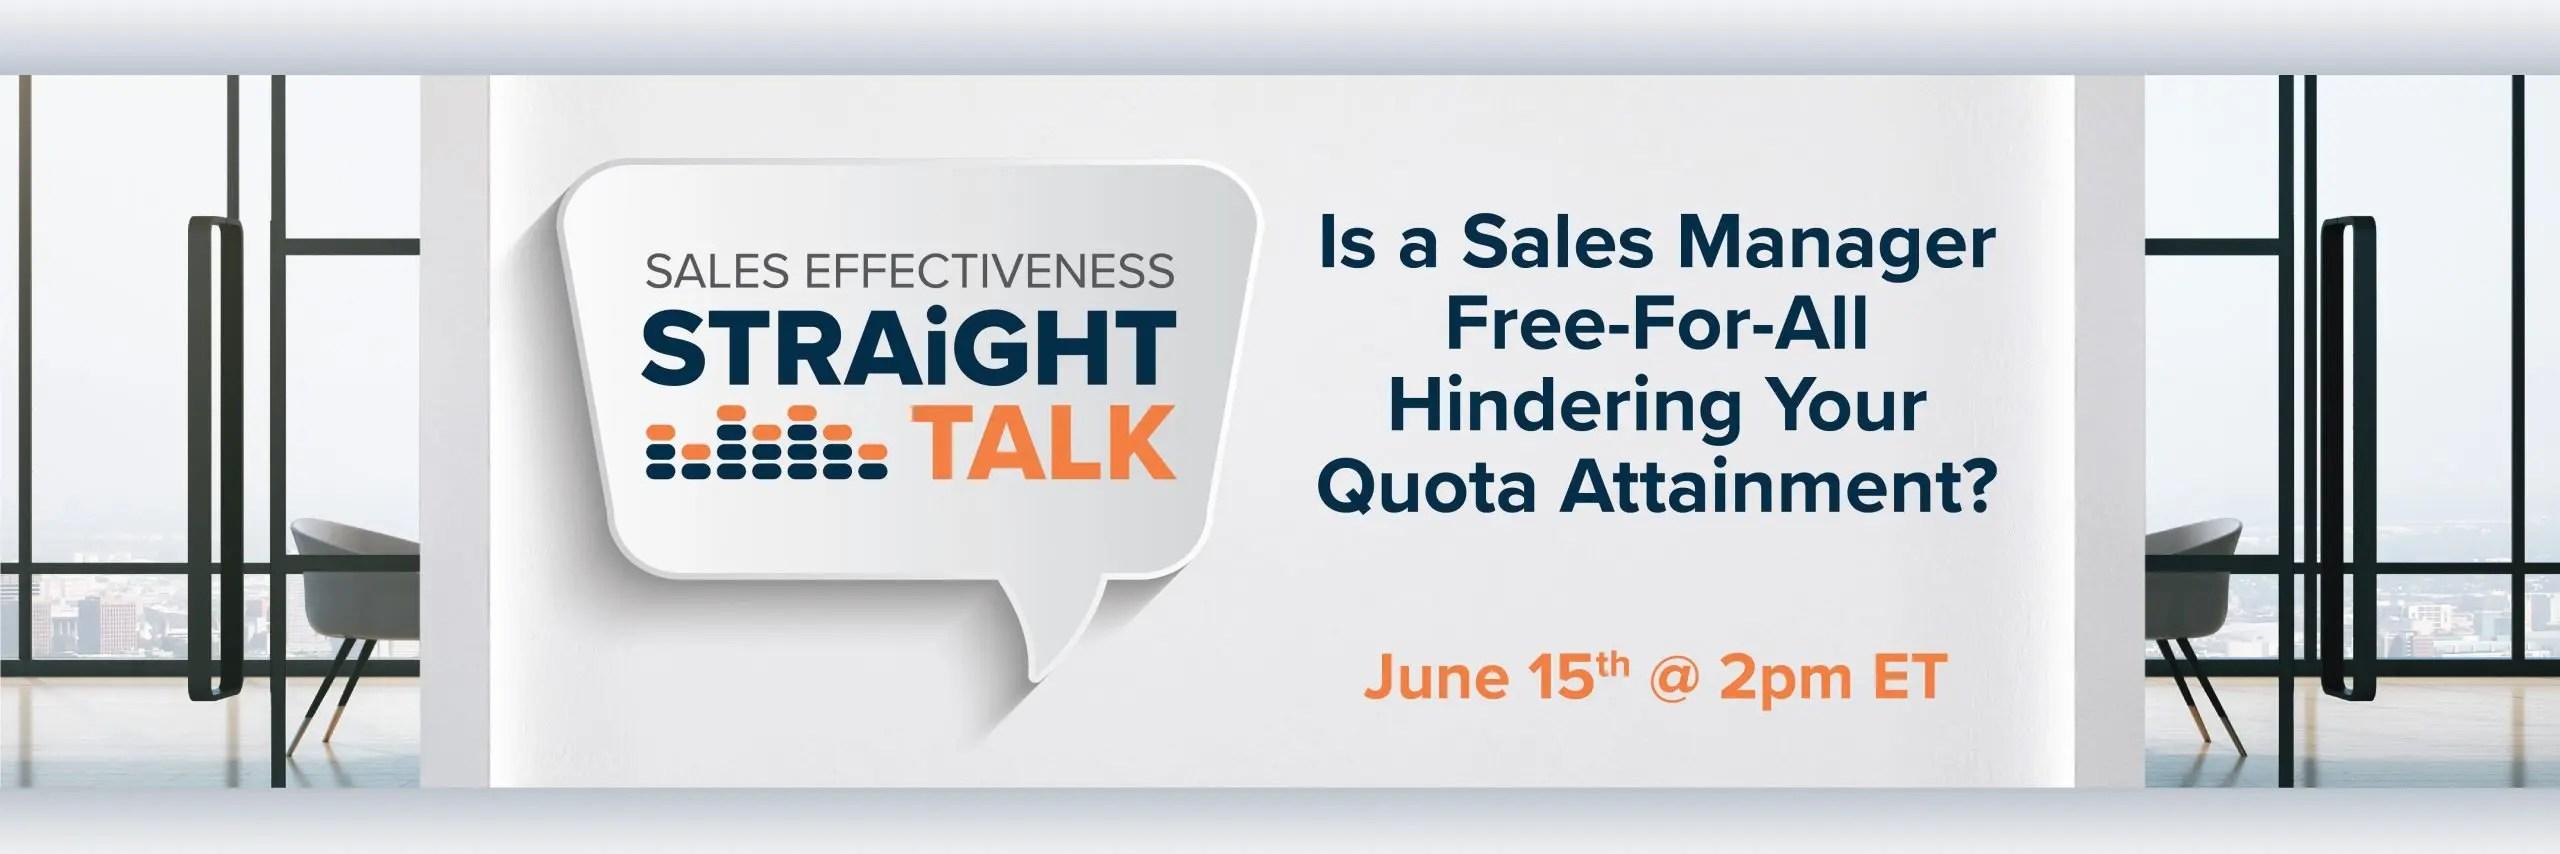 sales effectiveness straight talk